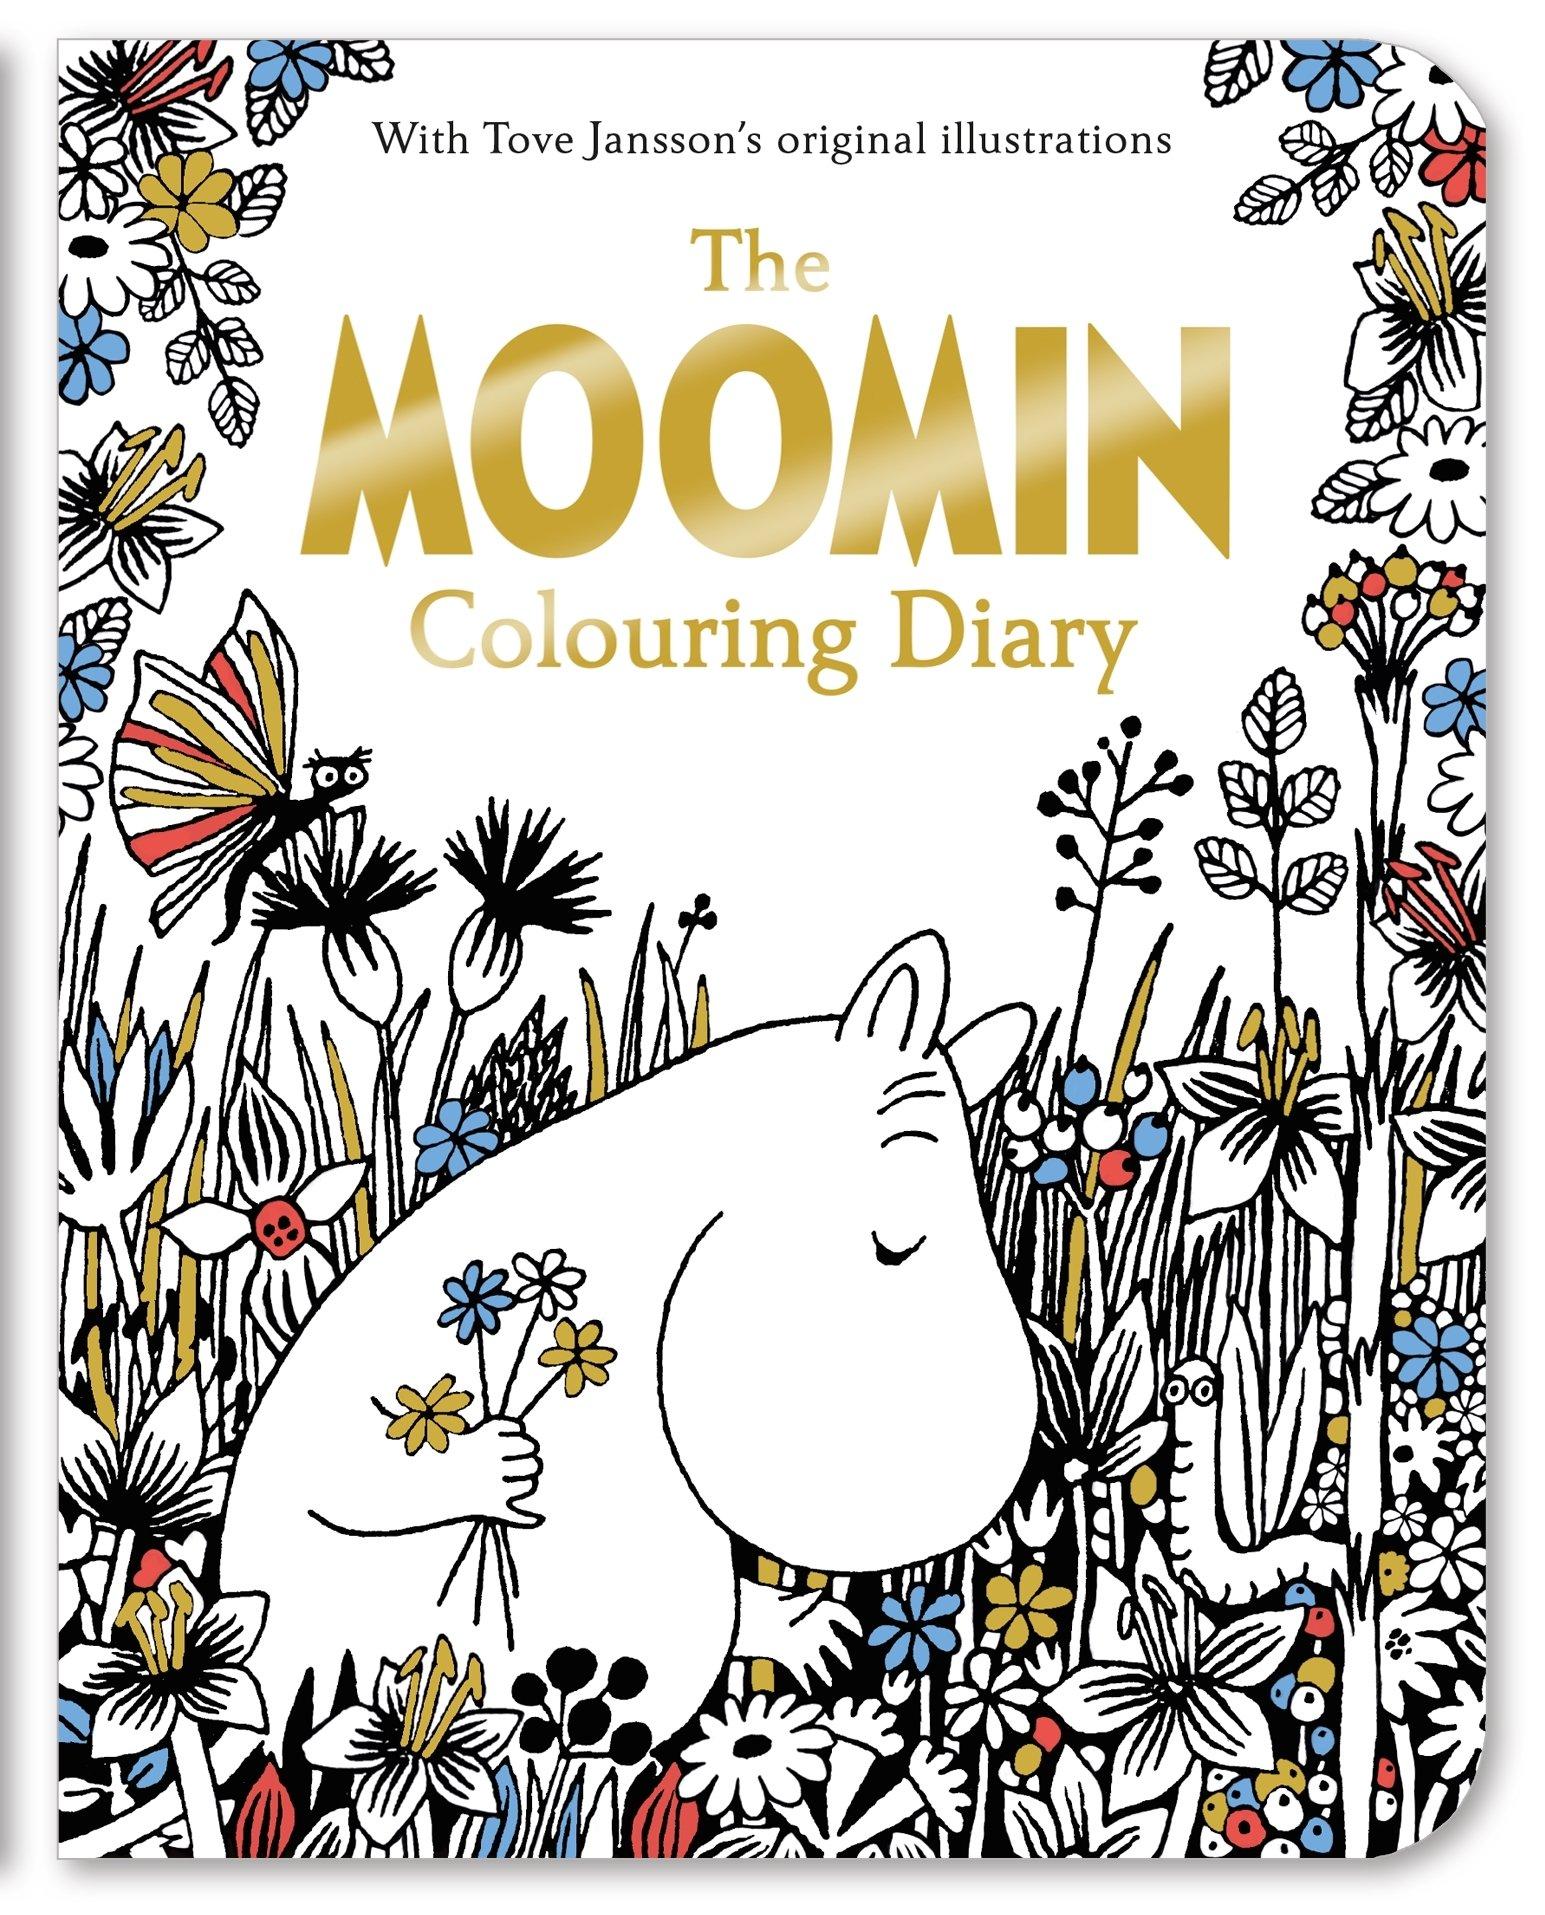 The Moomin Colouring Diary